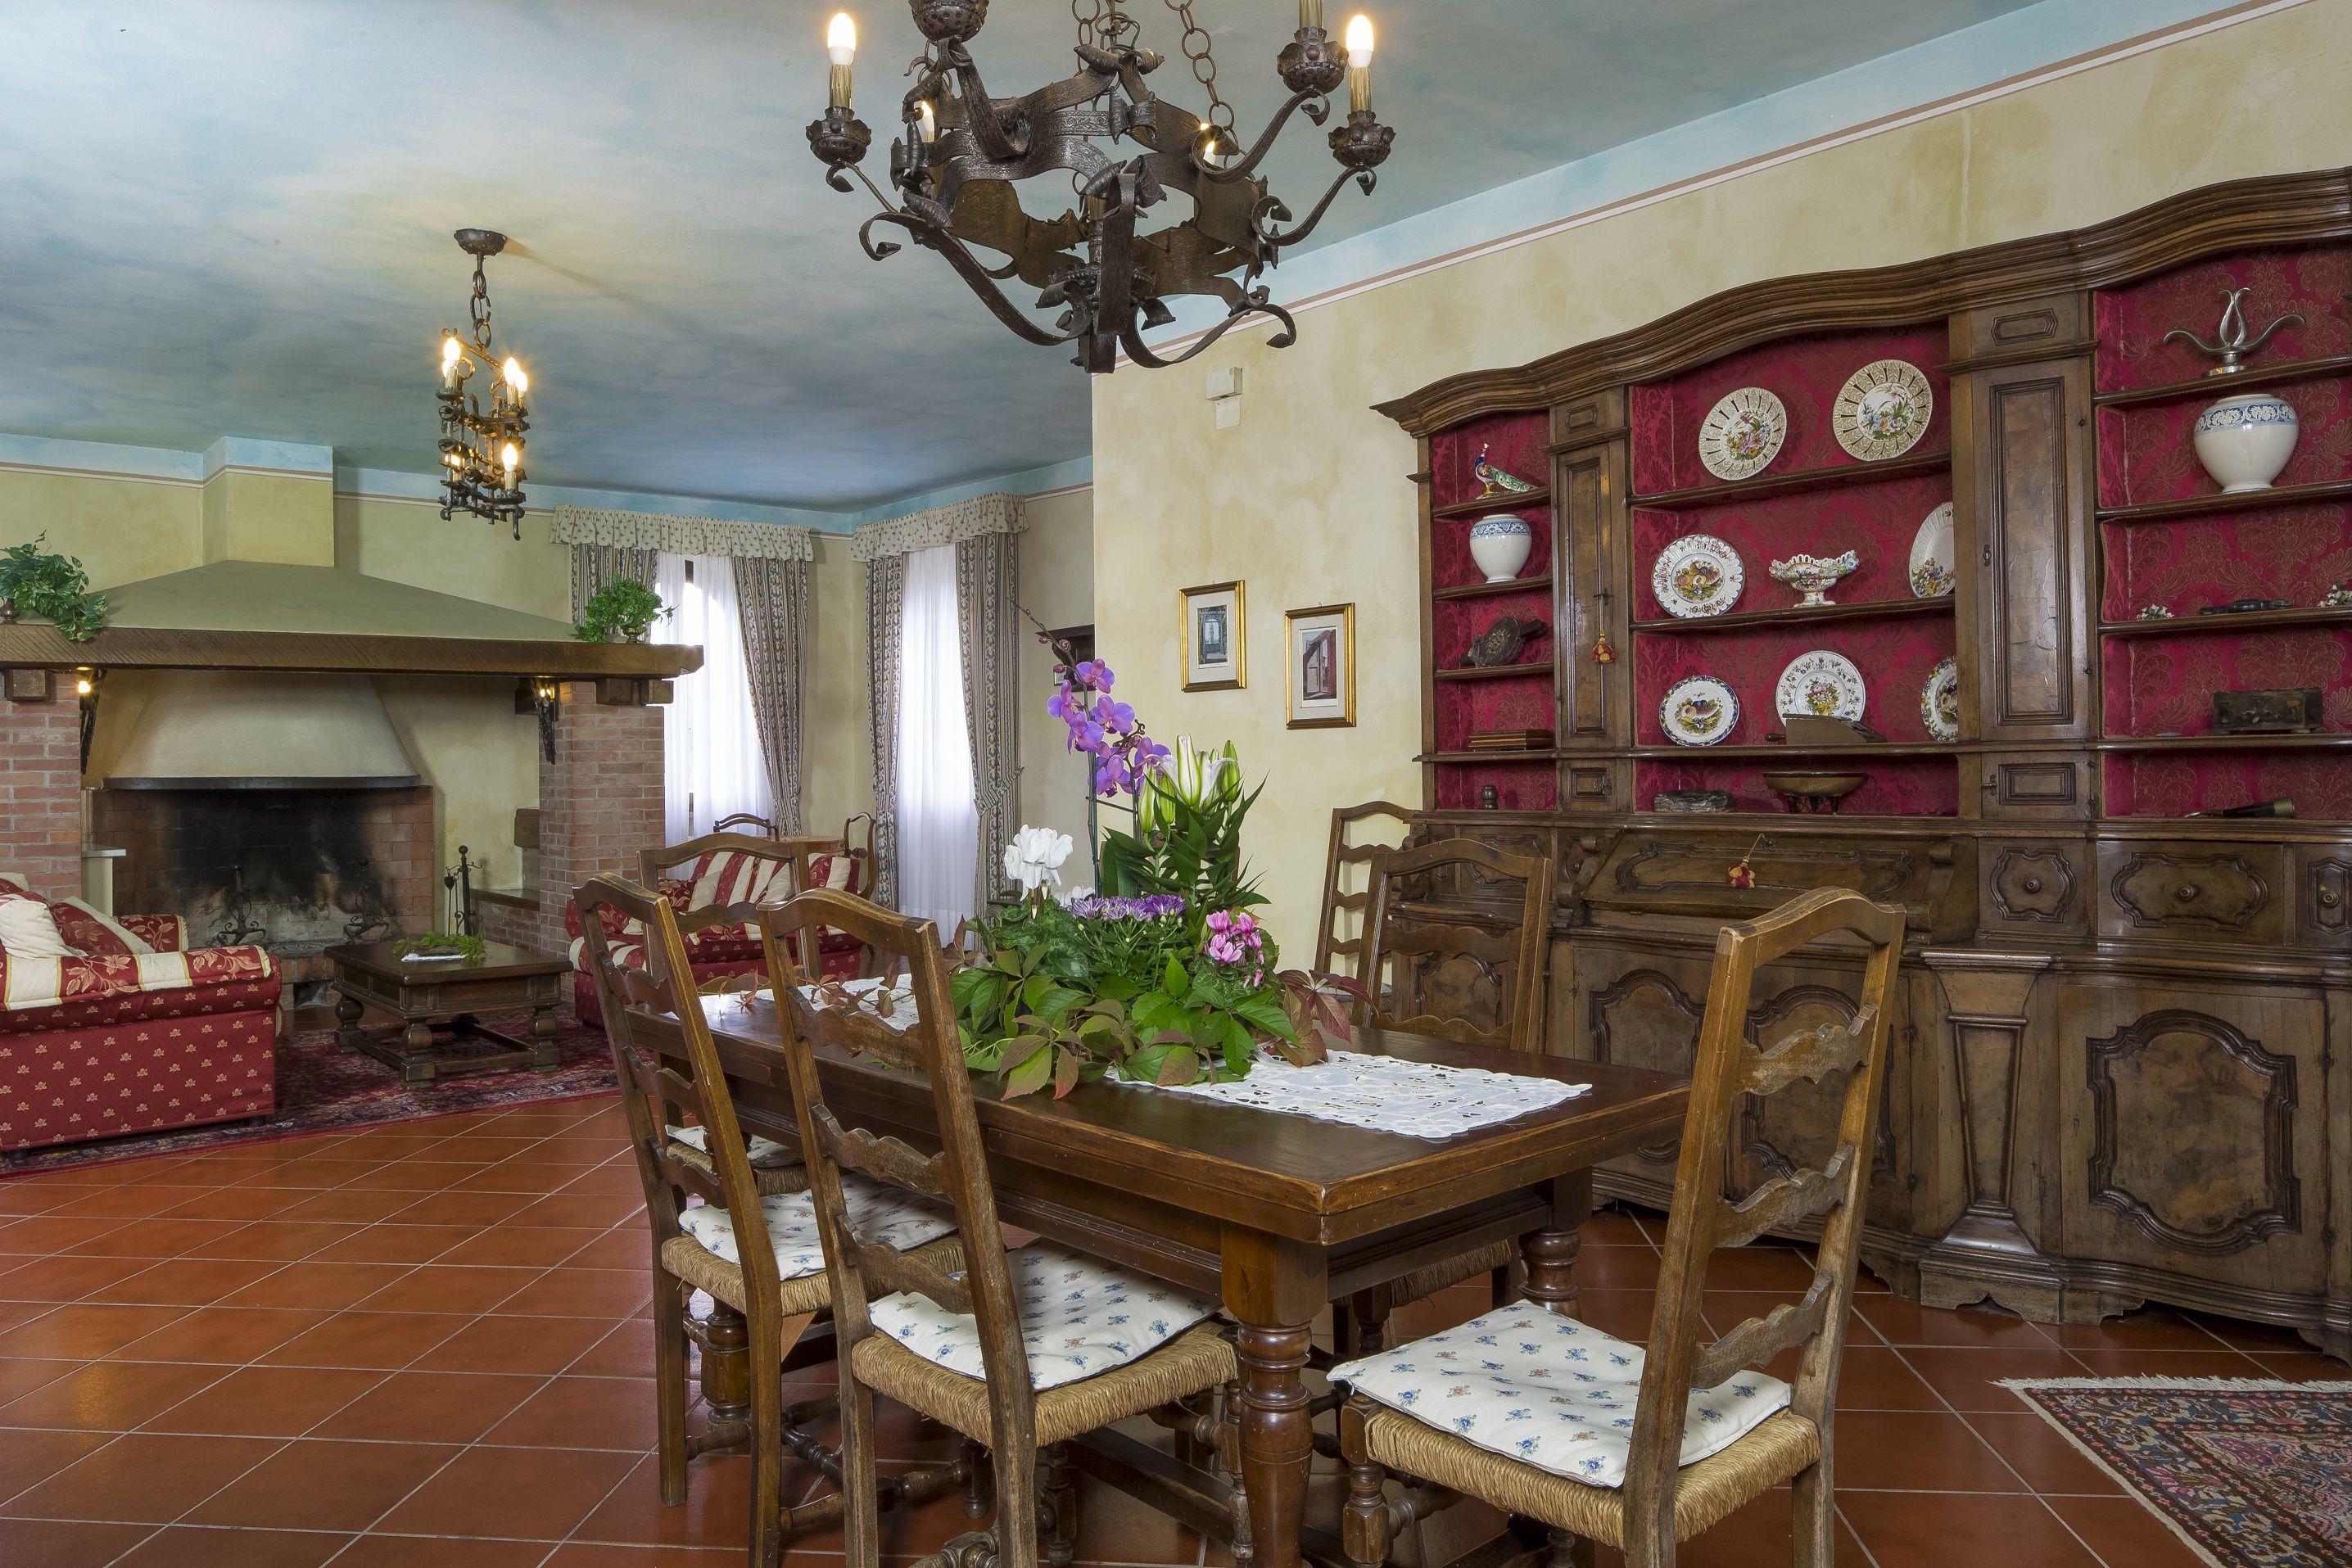 Apartment Bosco Lazzeroni Residence - Aida Holiday Home photo 19032191